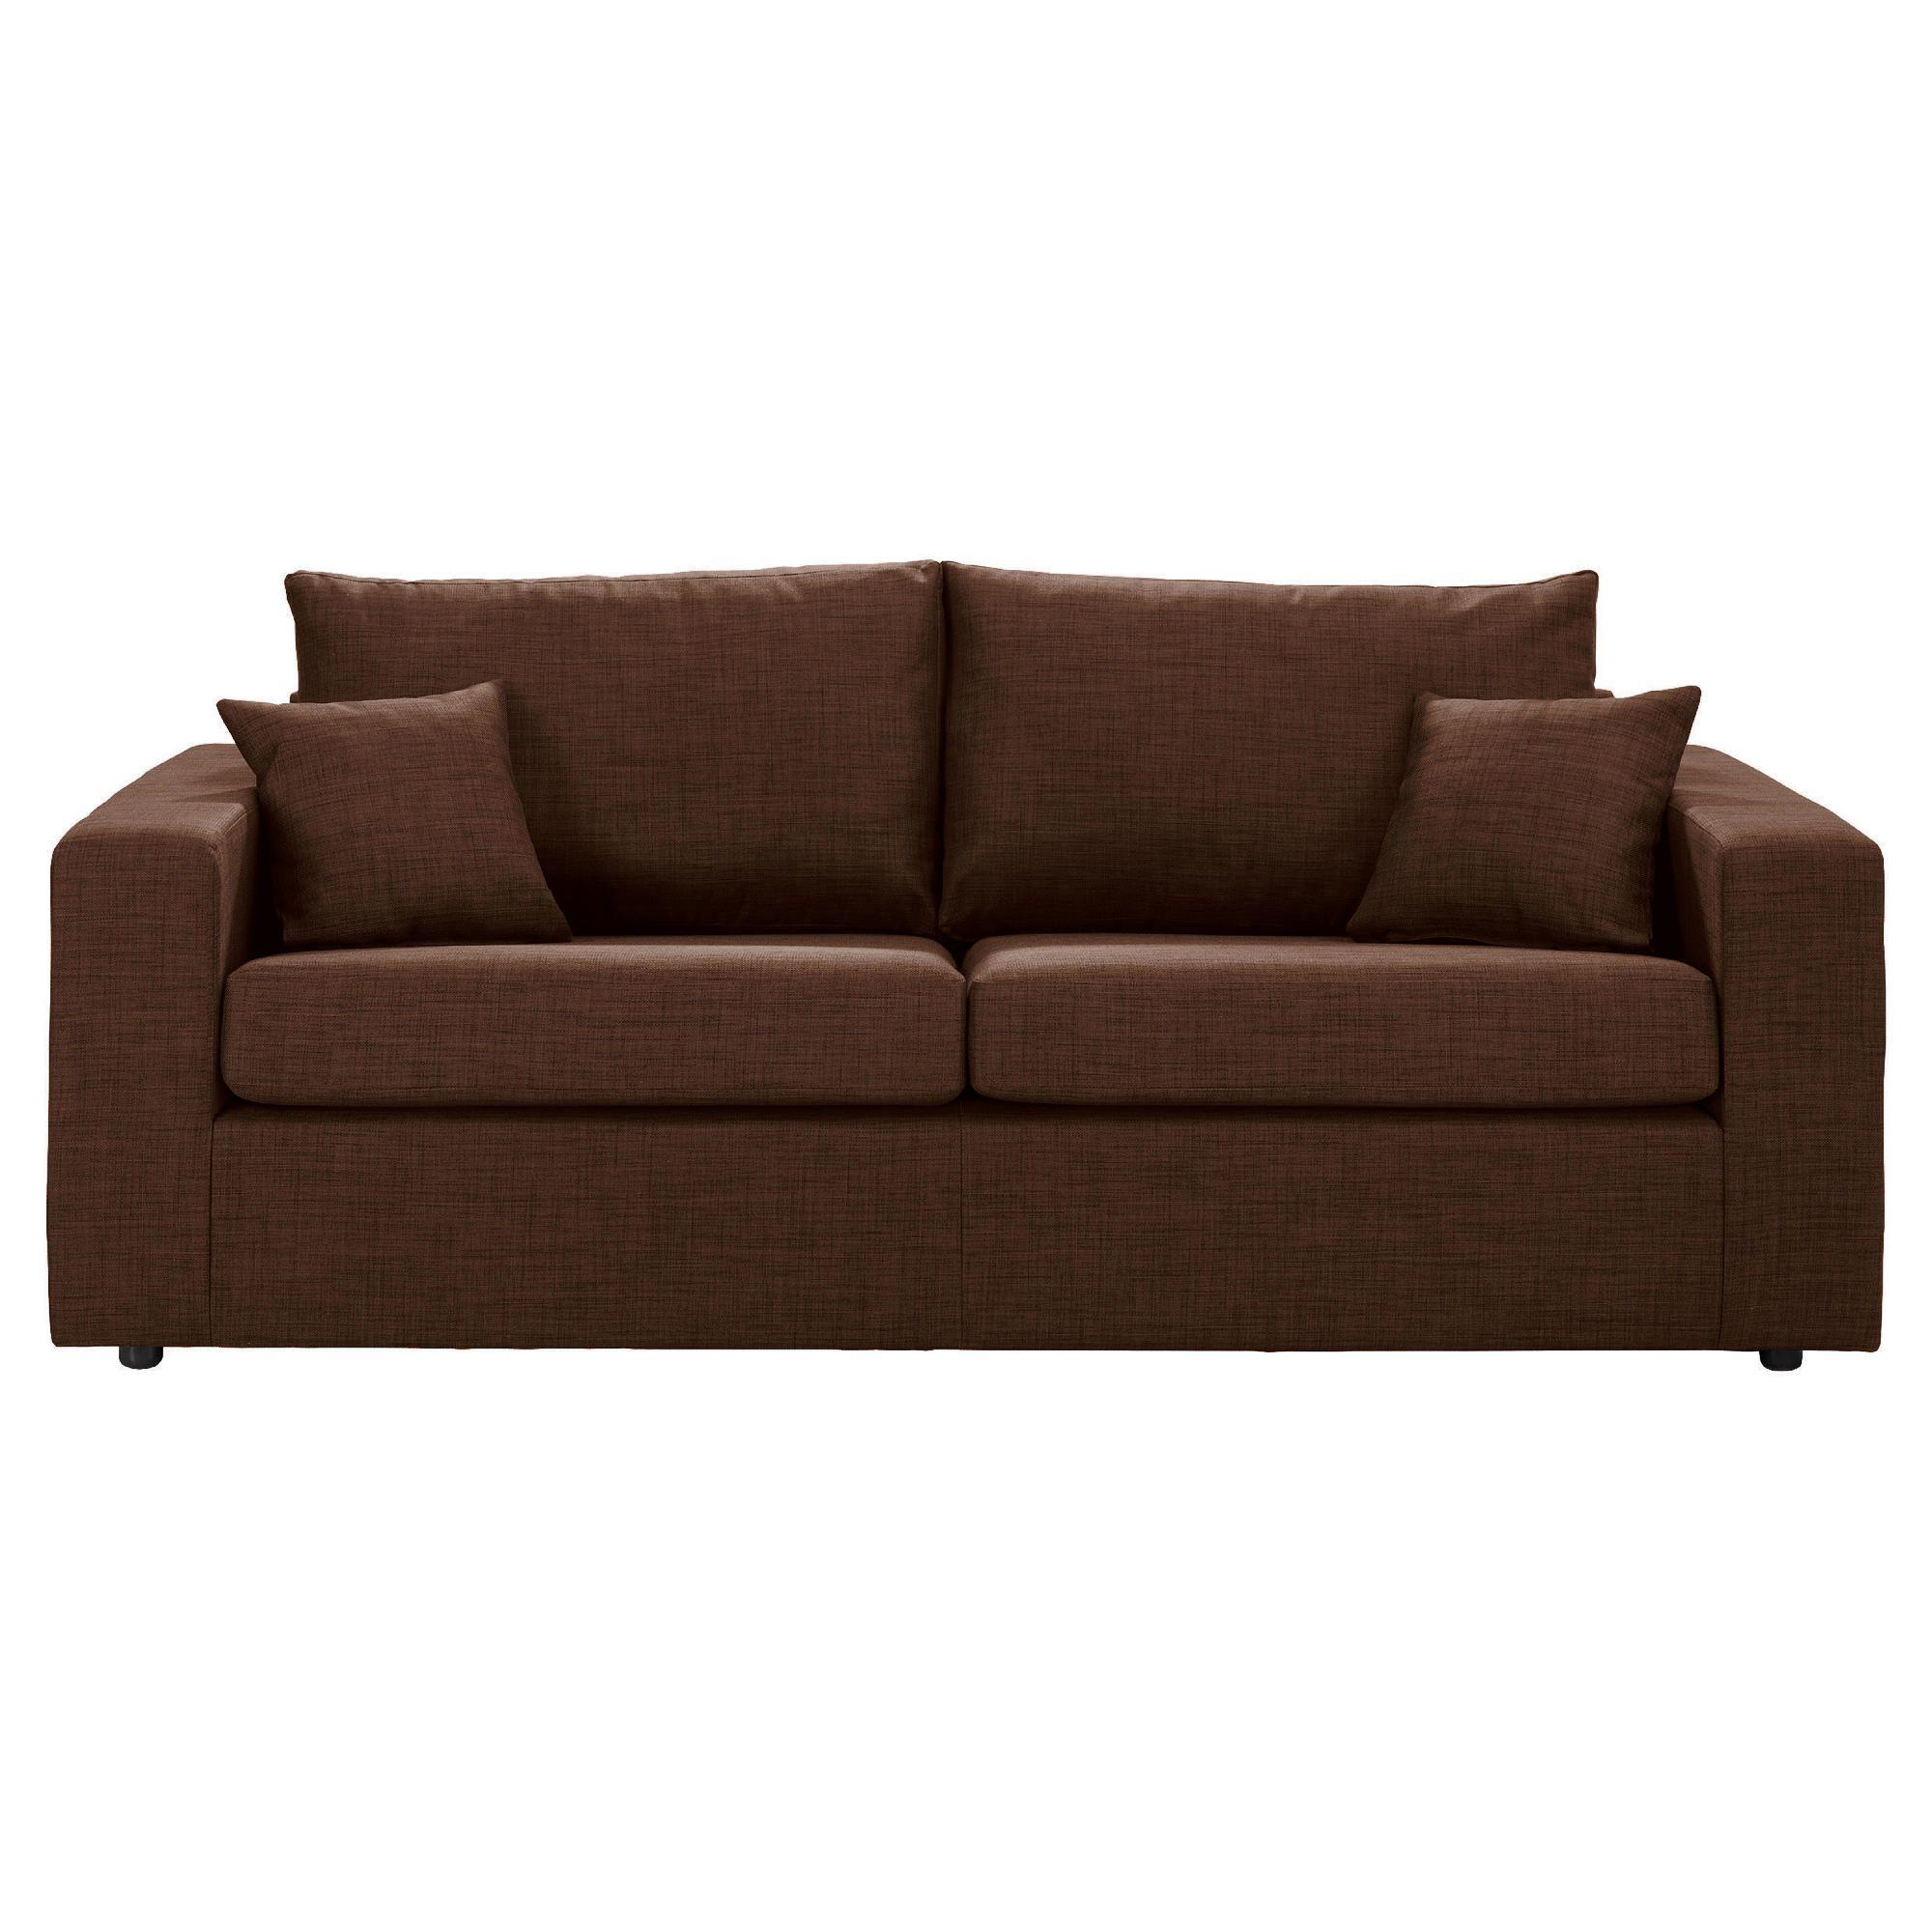 Maison Large Fabric Sofa, Chocolate at Tesco Direct